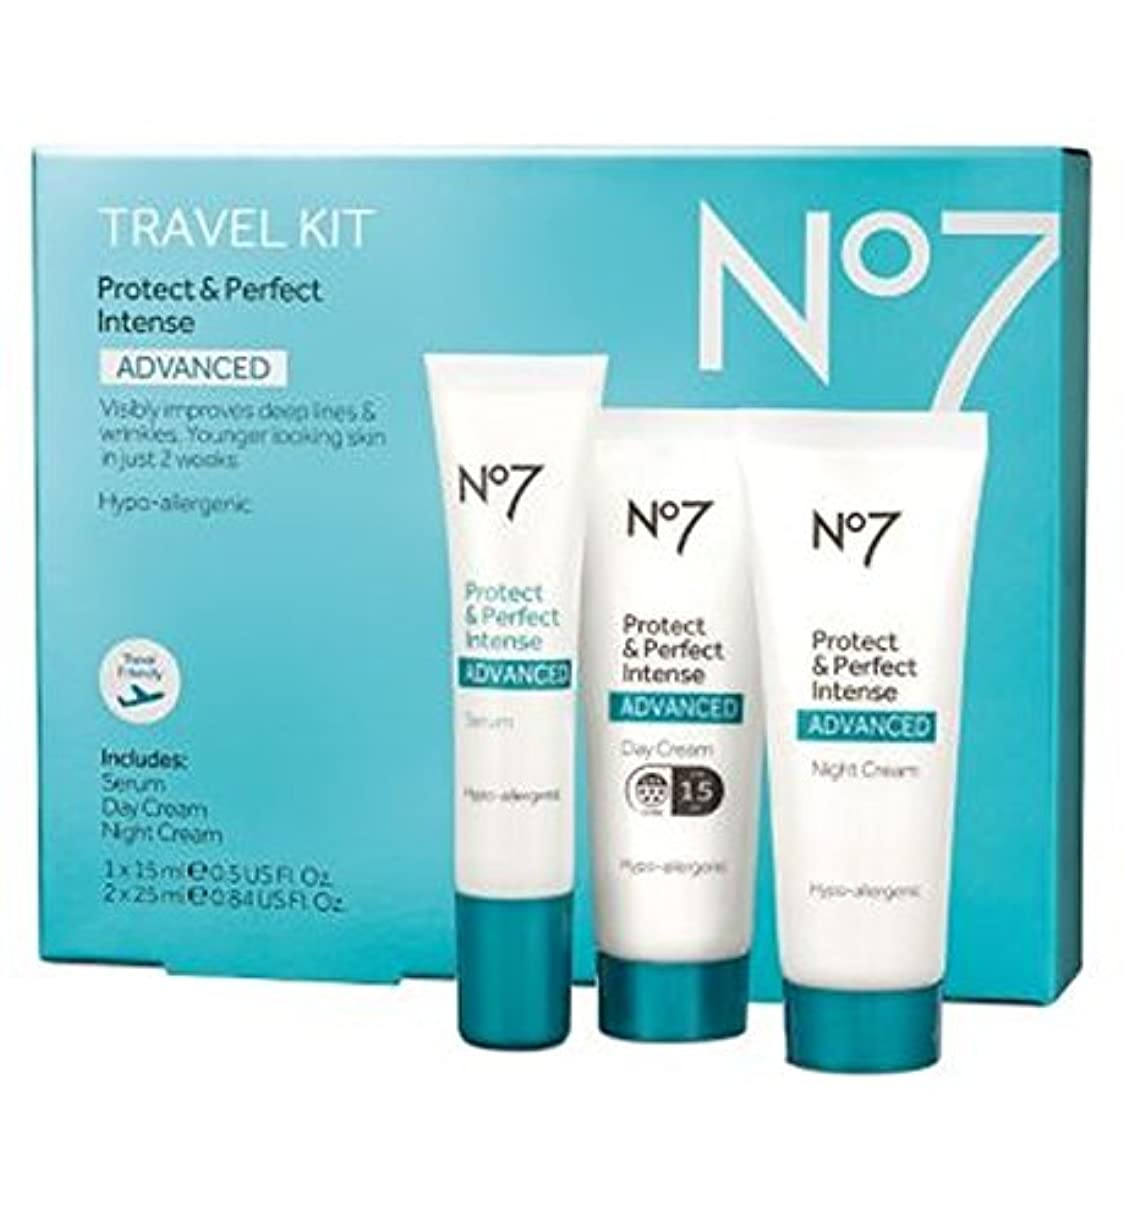 No7保護&完璧な強烈な高度な旅行キット (No7) (x2) - No7 Protect & Perfect Intense ADVANCED Travel Kit (Pack of 2) [並行輸入品]